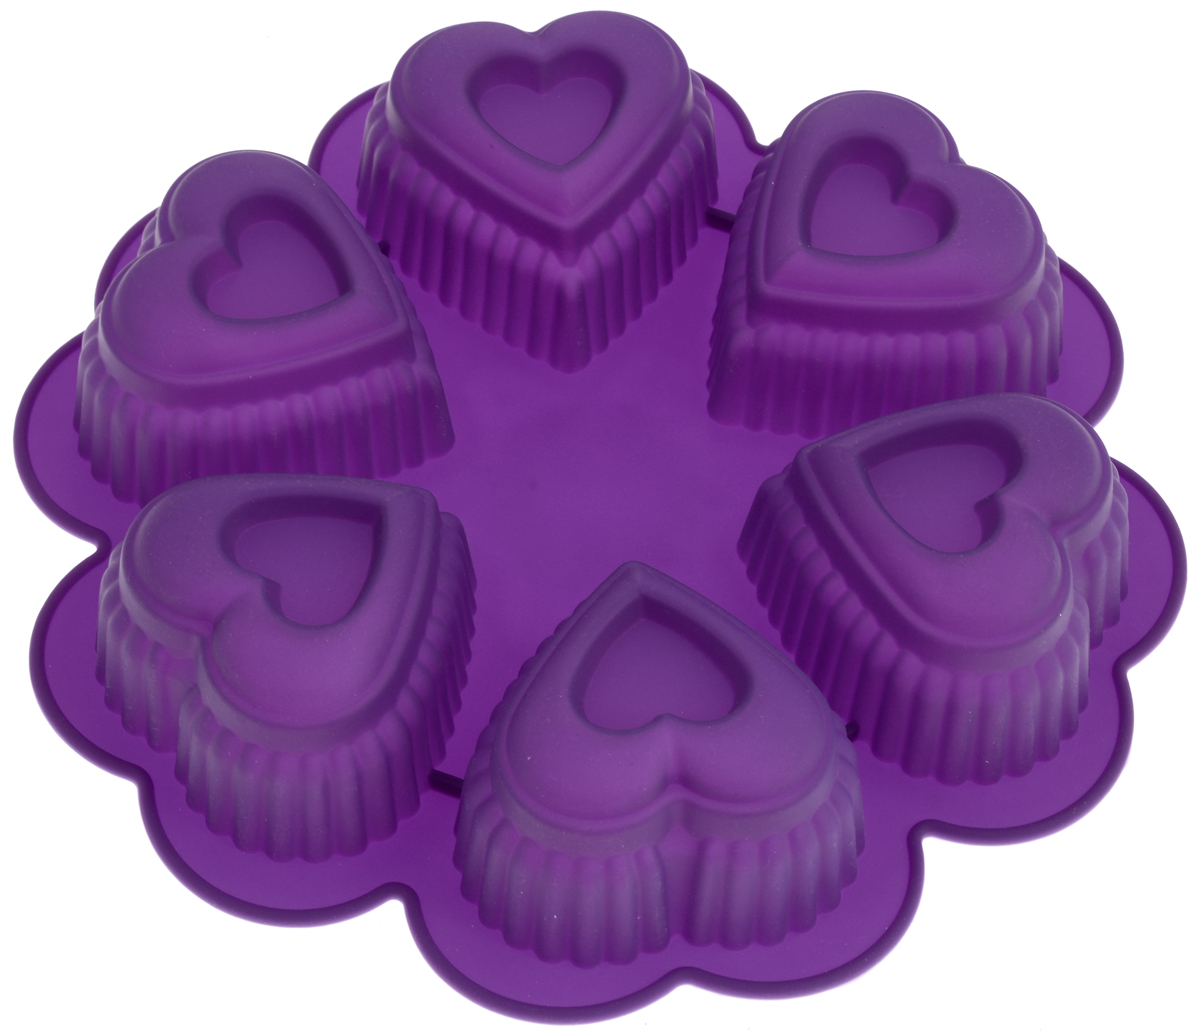 Форма для выпечки Marmiton Сердце, цвет: фиолетовый, 25,5 х 25,5 х 5 см, 6 ячеек набор форм для запекания marmiton 22 х 11 5 х 6 см 5 шт